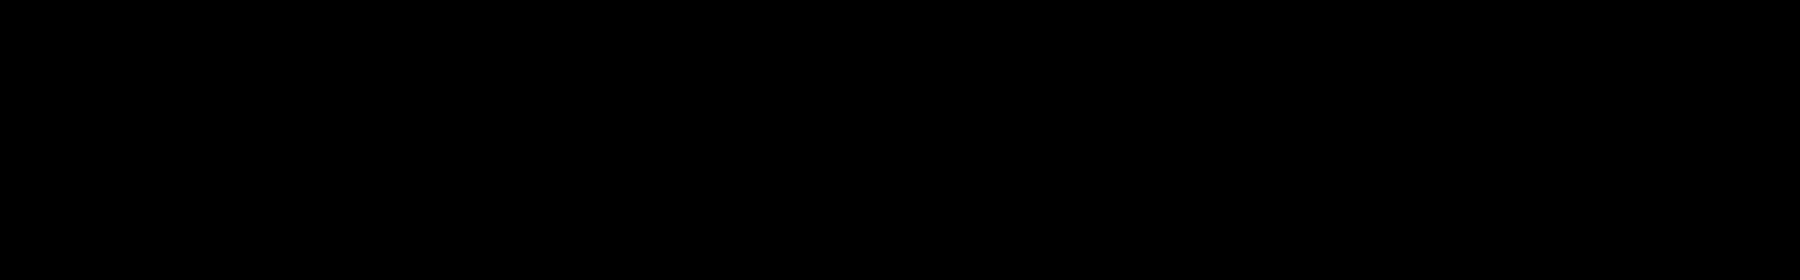 Black Trap 2 audio waveform